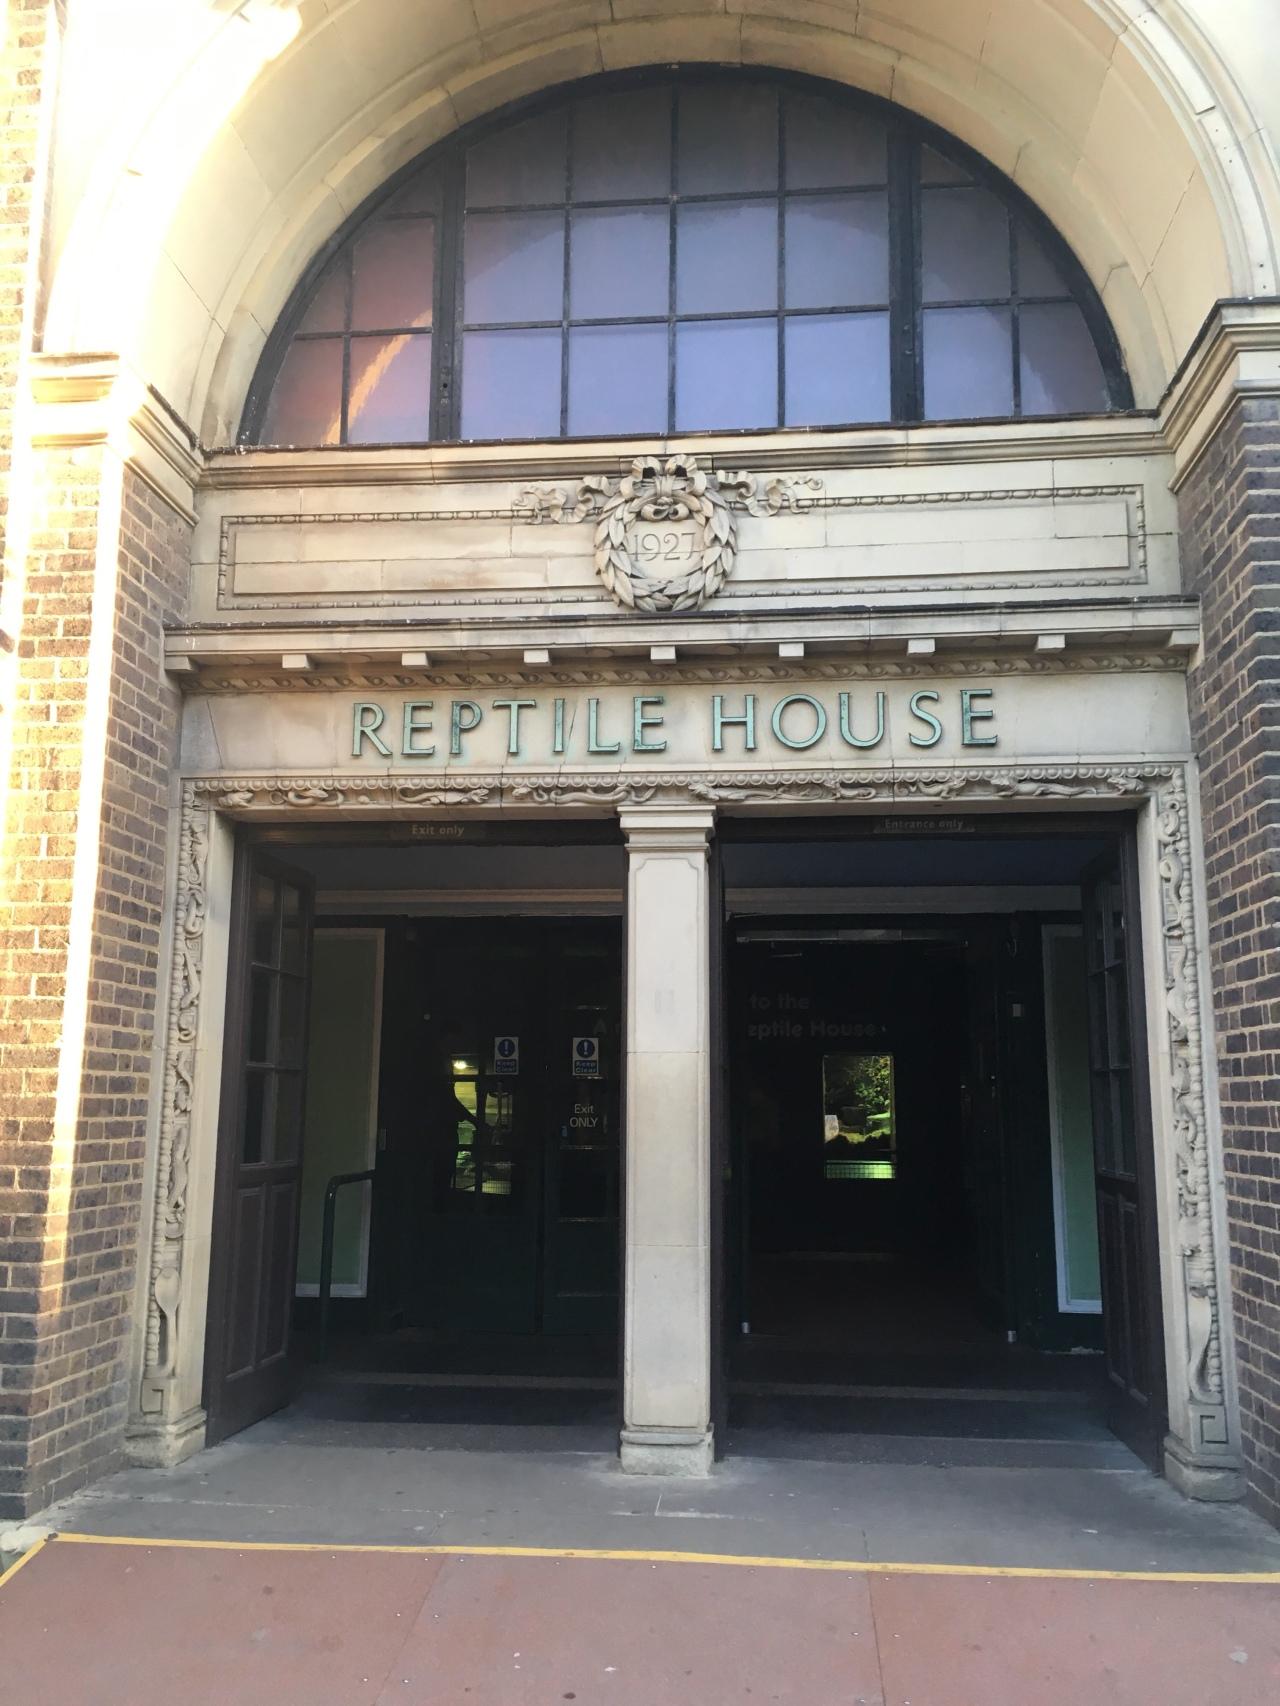 Reptile House London Zoo Harry Potter